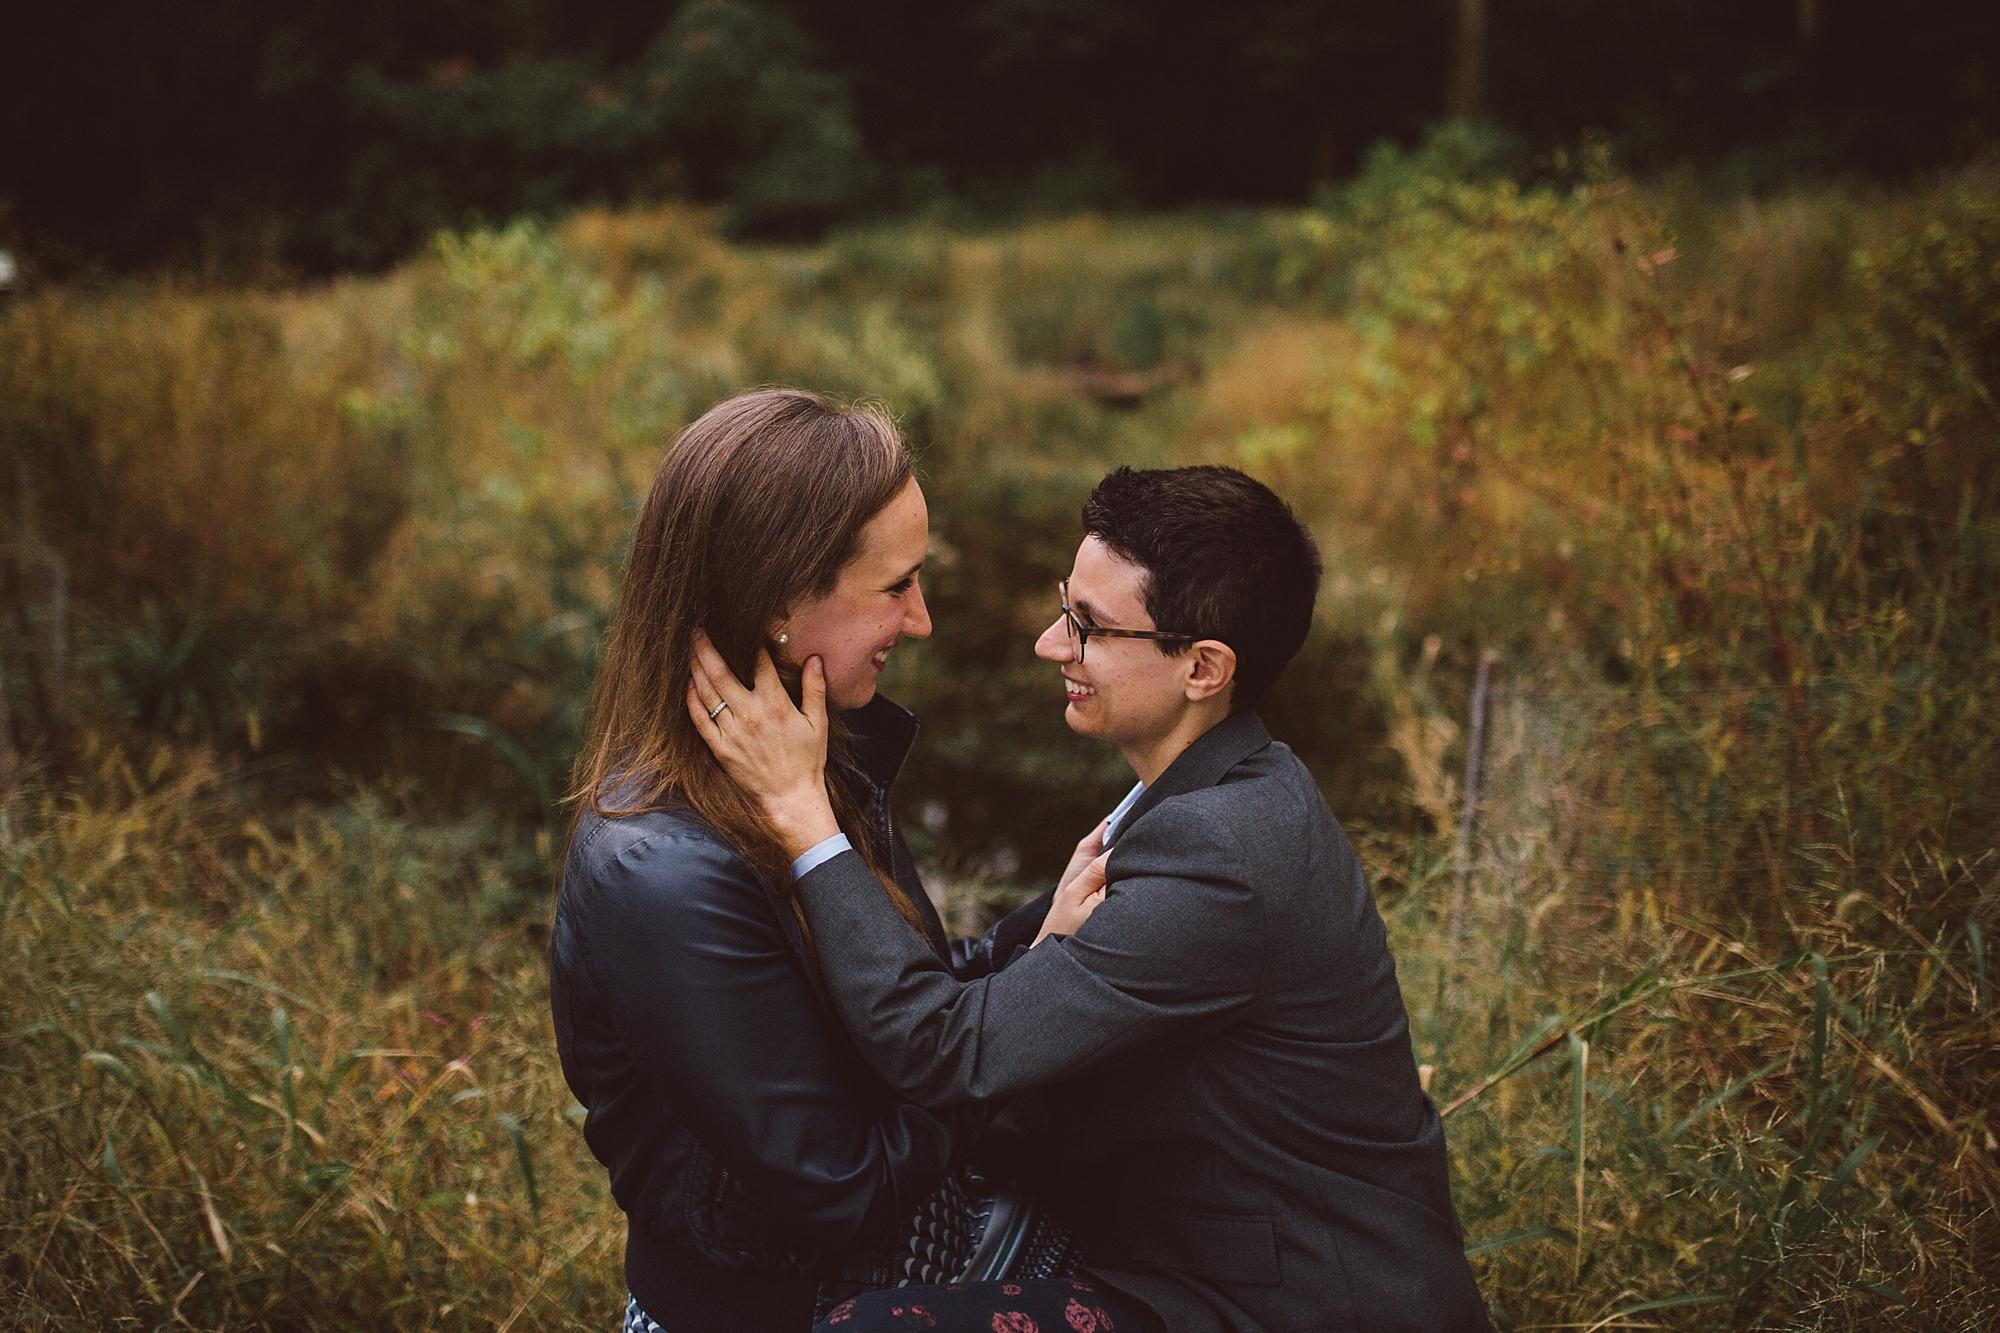 Joe_Mac_Creative_Philadelphila_Wedding_Photography_LGBTQ_Gay_Lesbian_Queer__0044.jpg